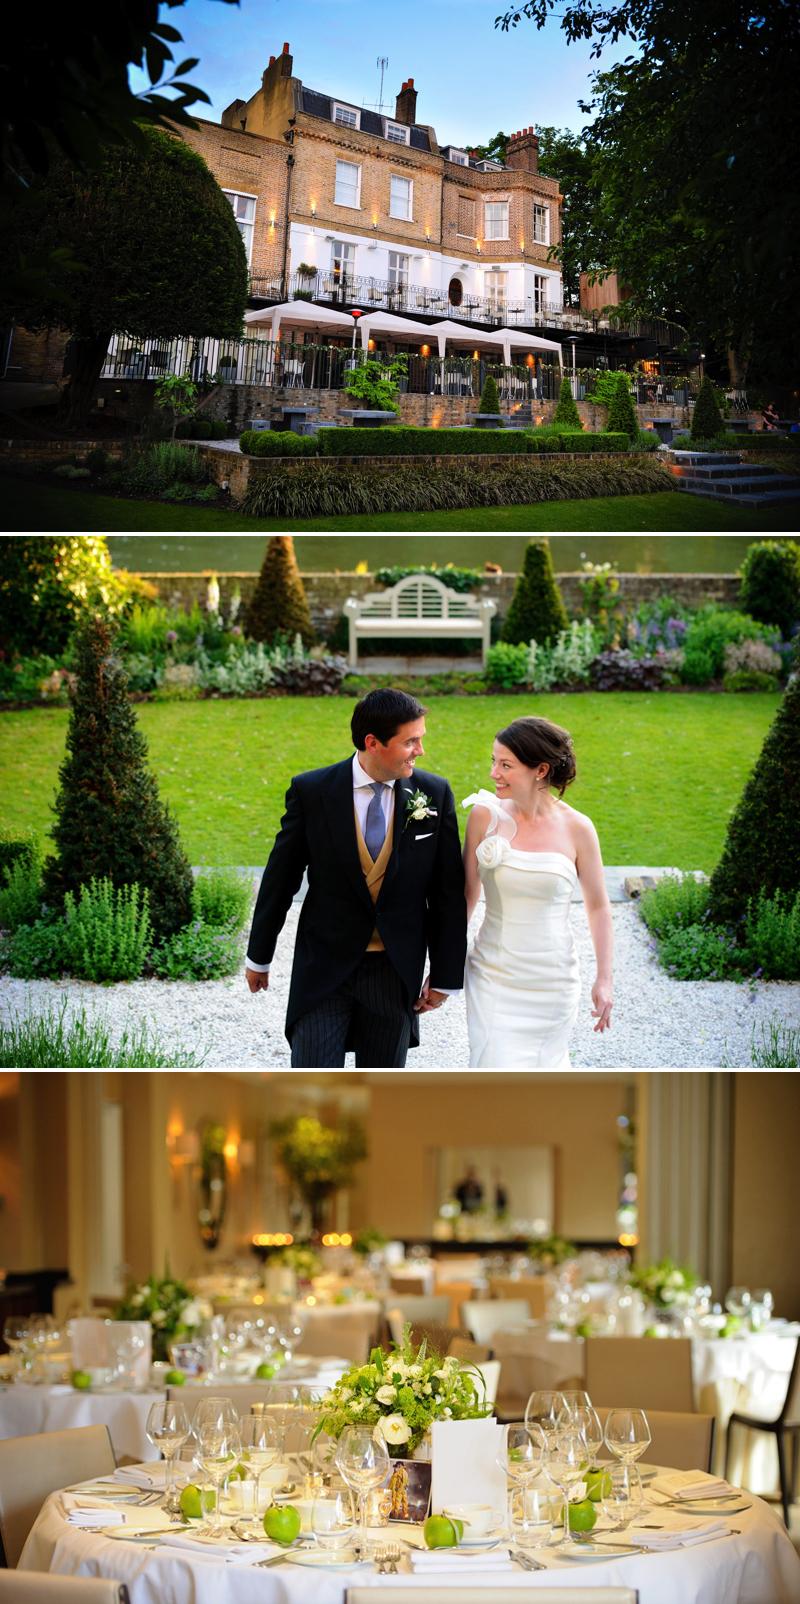 wedding-venues-in-surrey-the-bingham-london-5